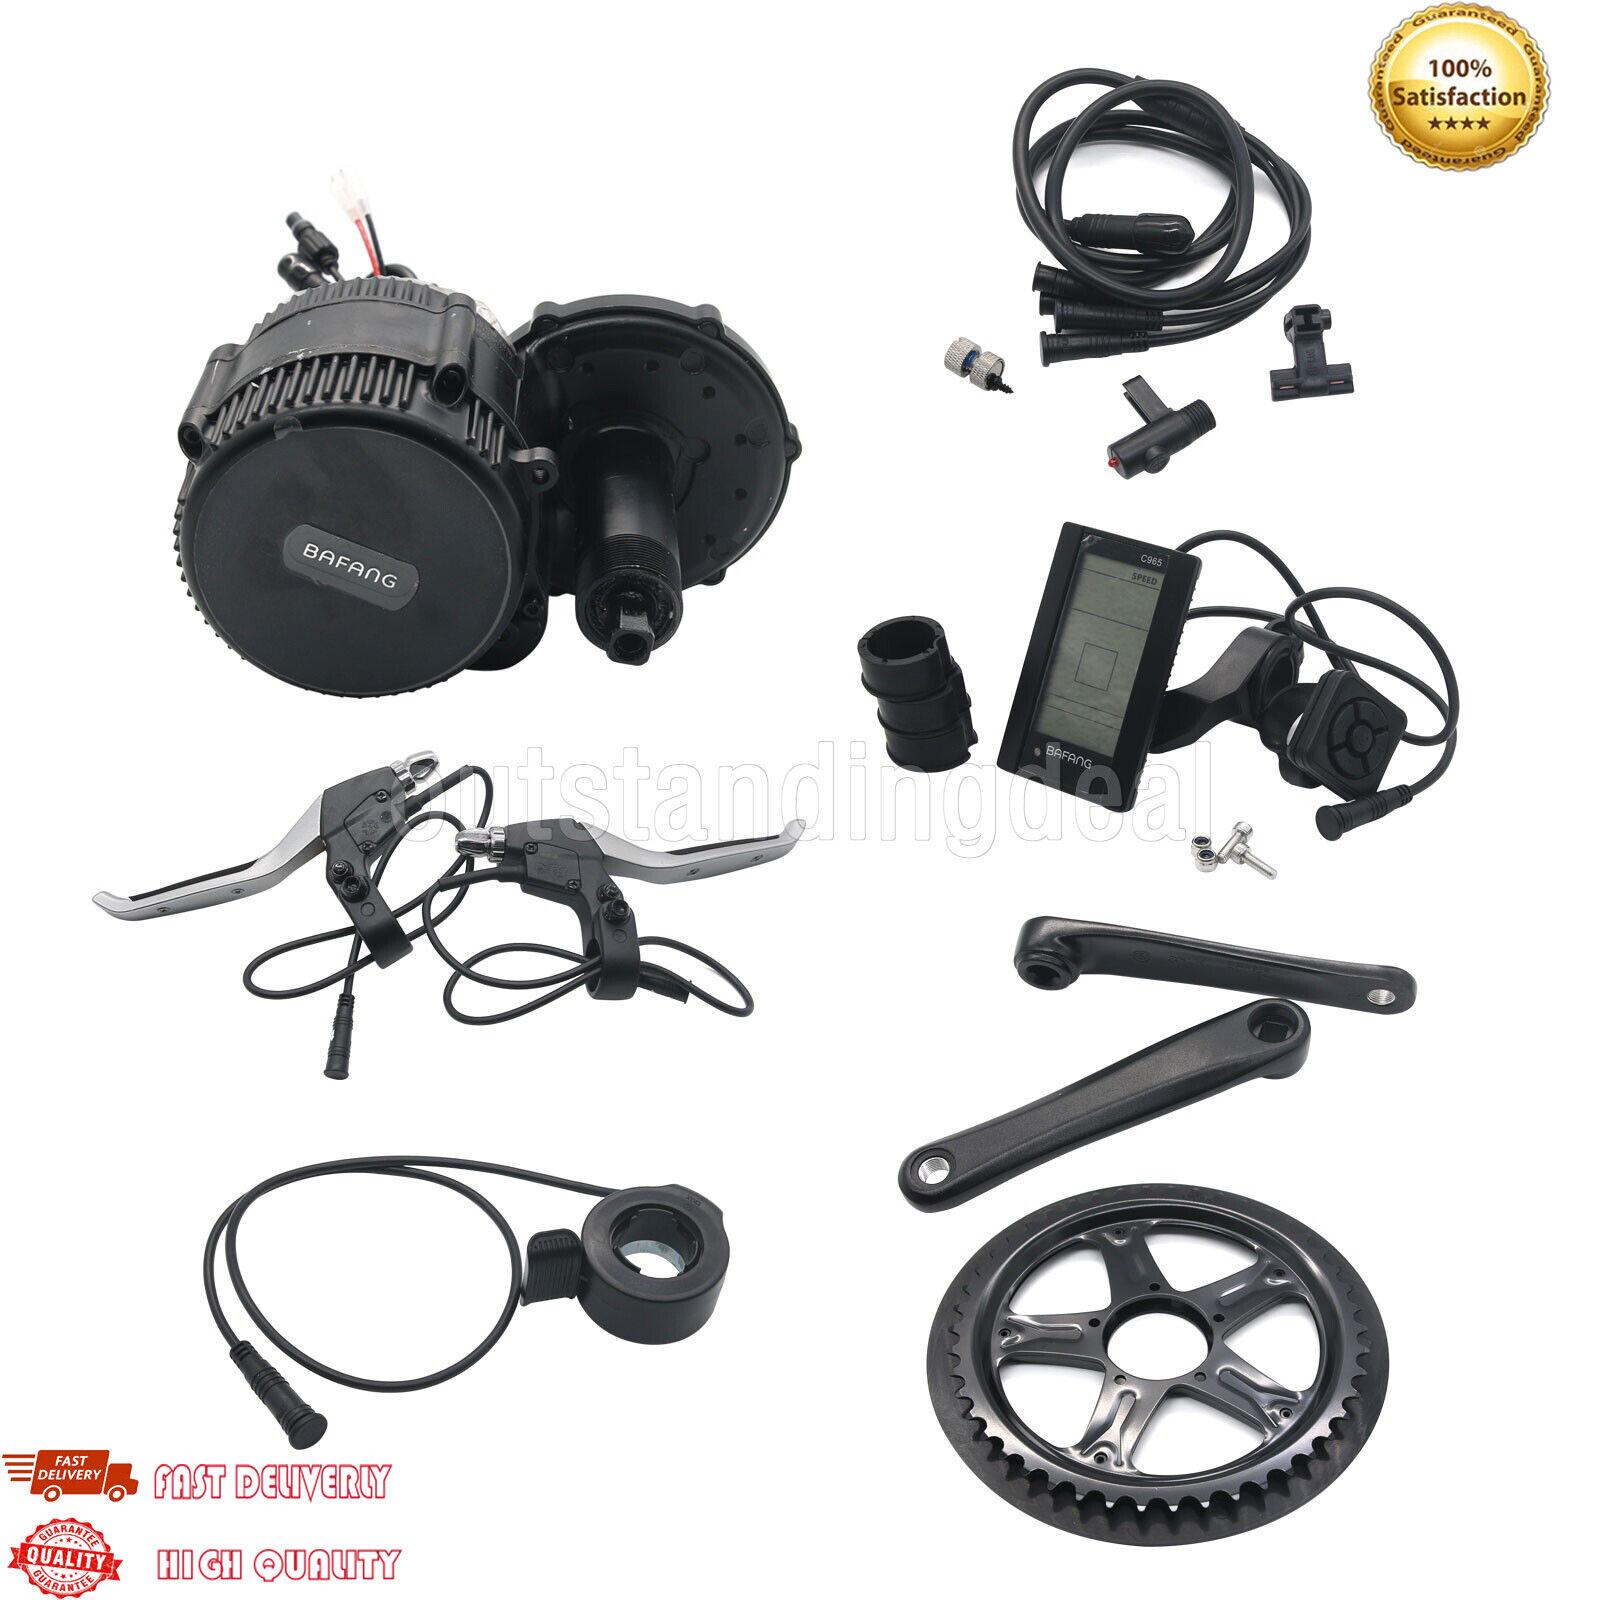 Bbs02 48v 750w 8fun Bafang mid Drive motor Electric Bike conversion kit bb 68mm